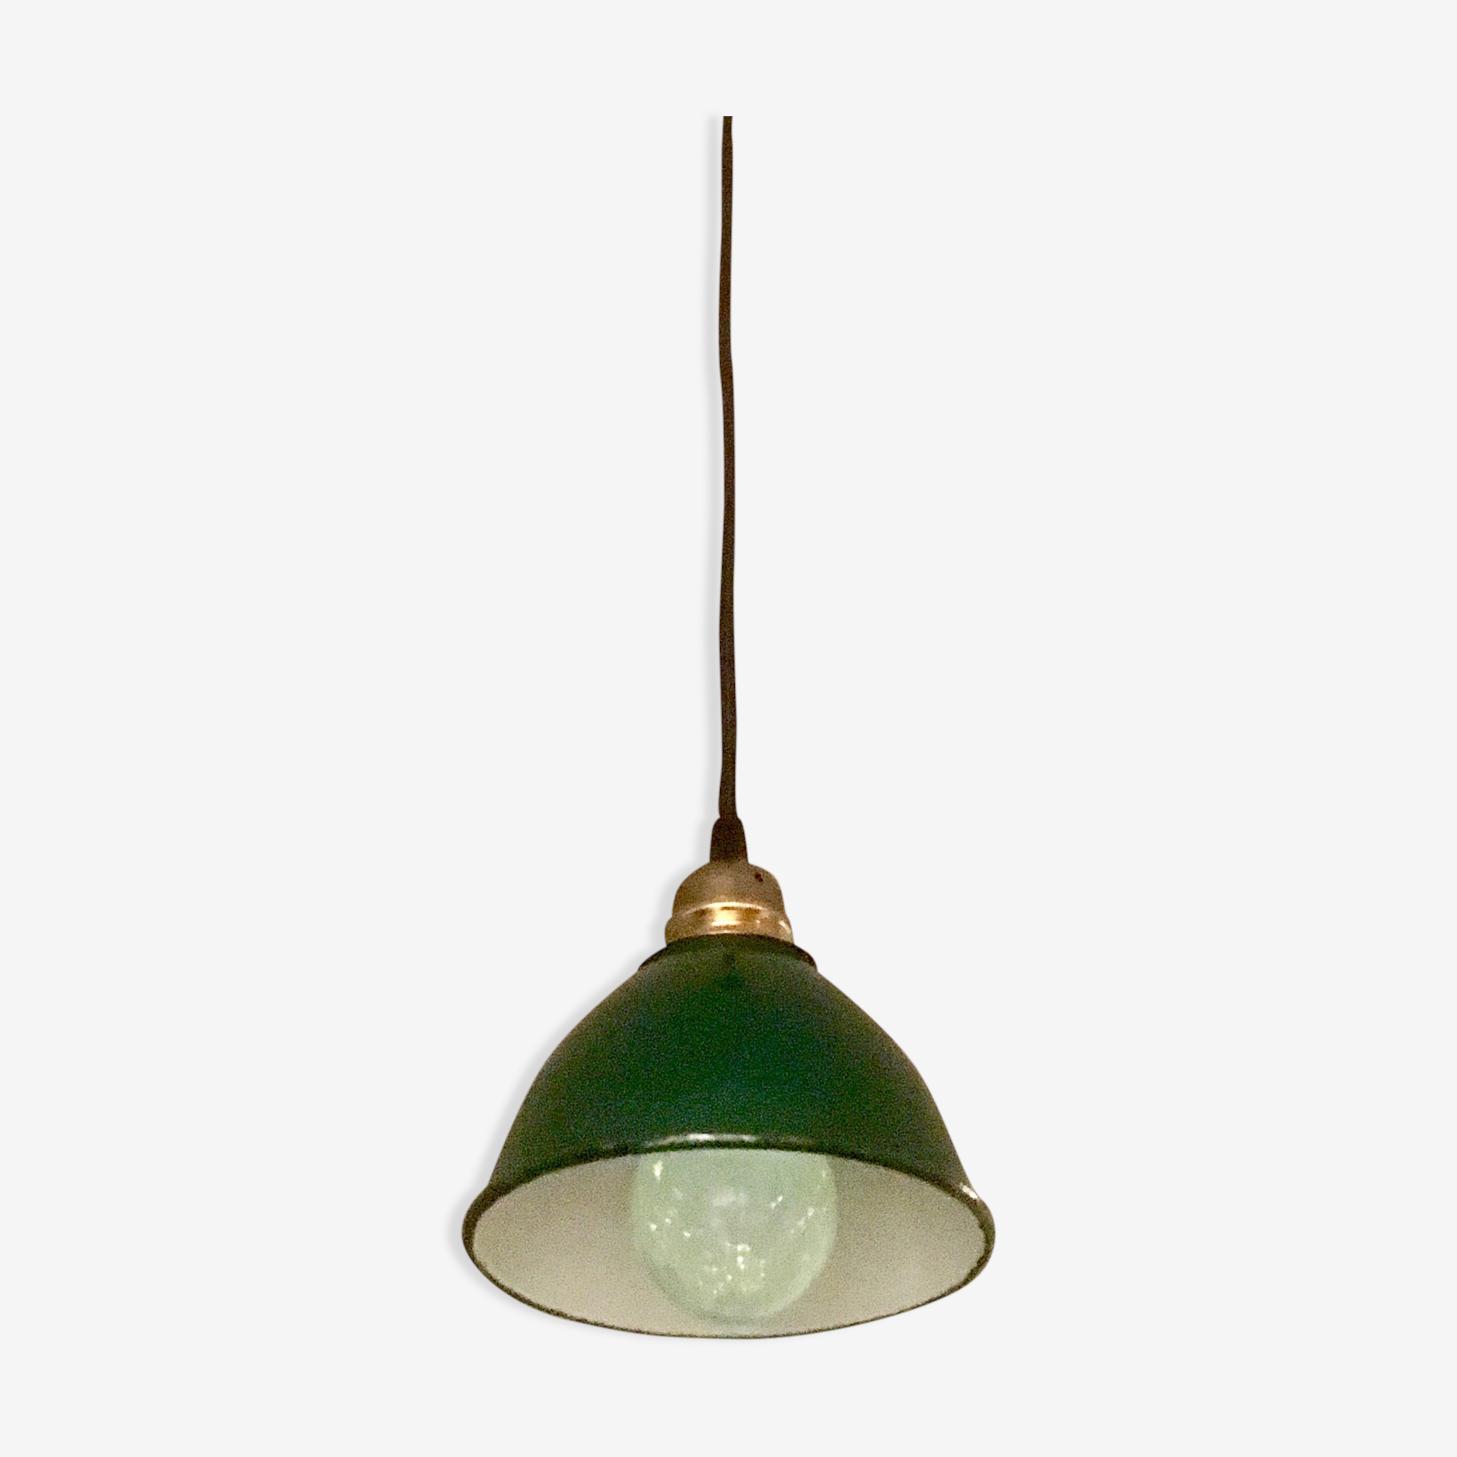 Small hanging indus enameled metal